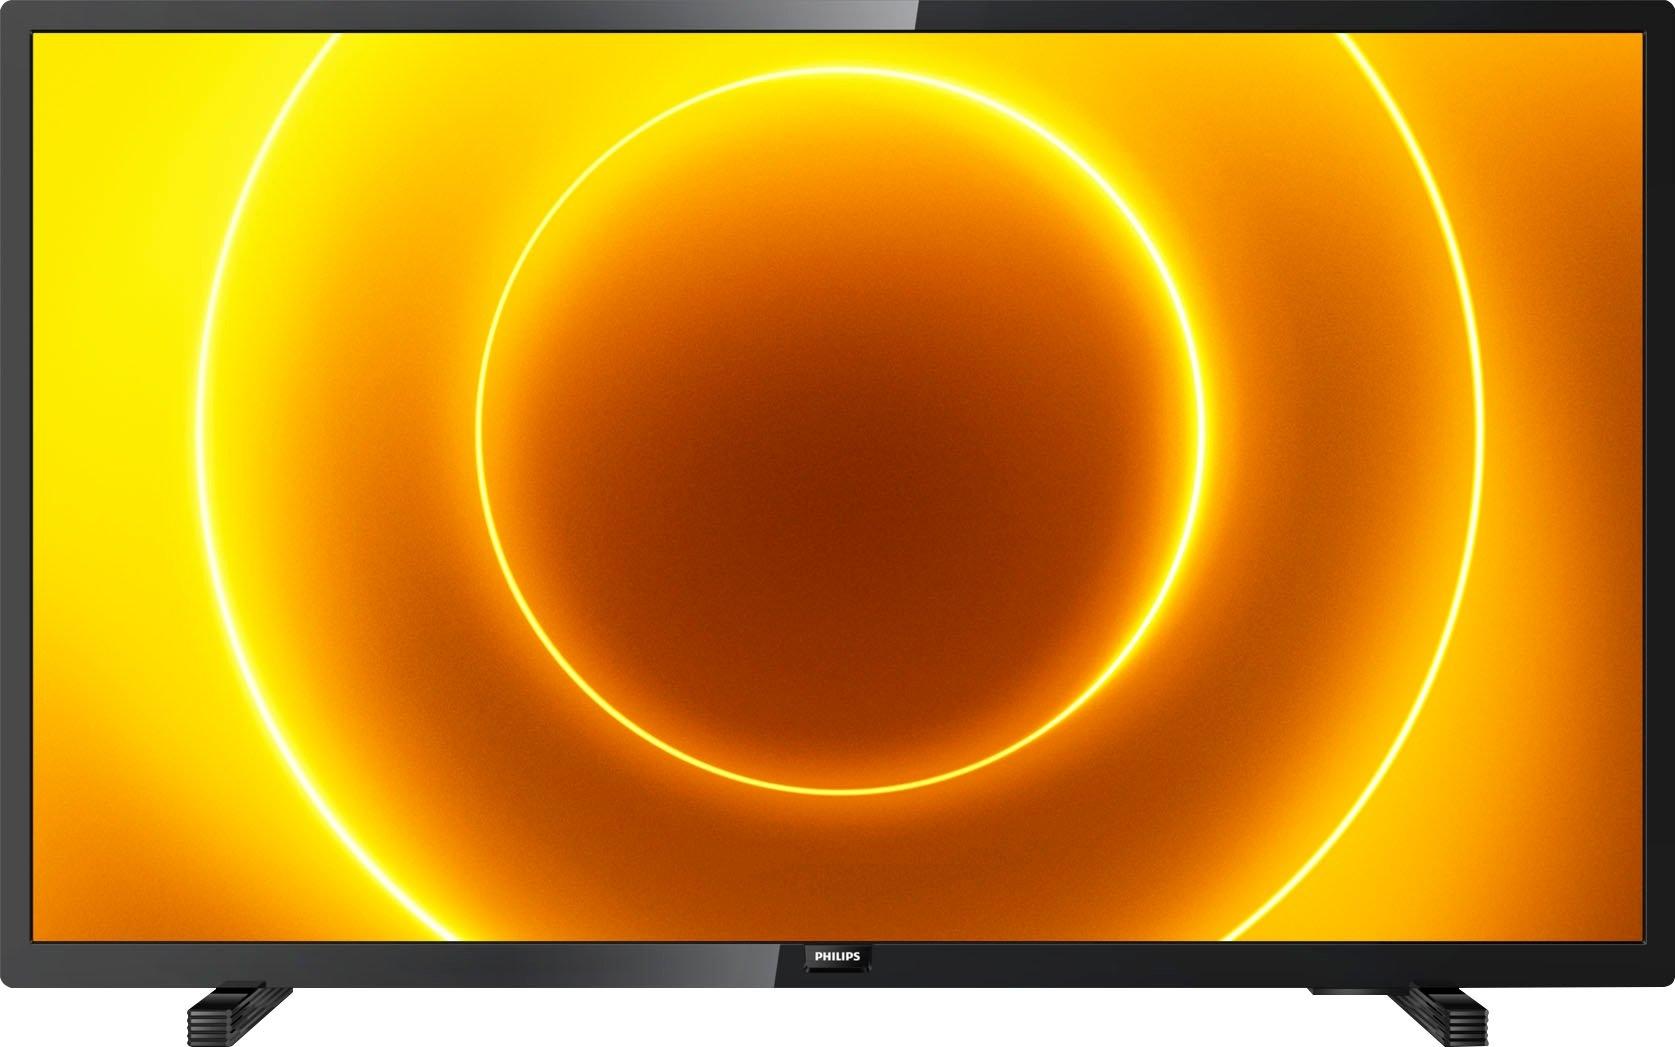 Philips »32PHS5505« LED-TV - verschillende betaalmethodes